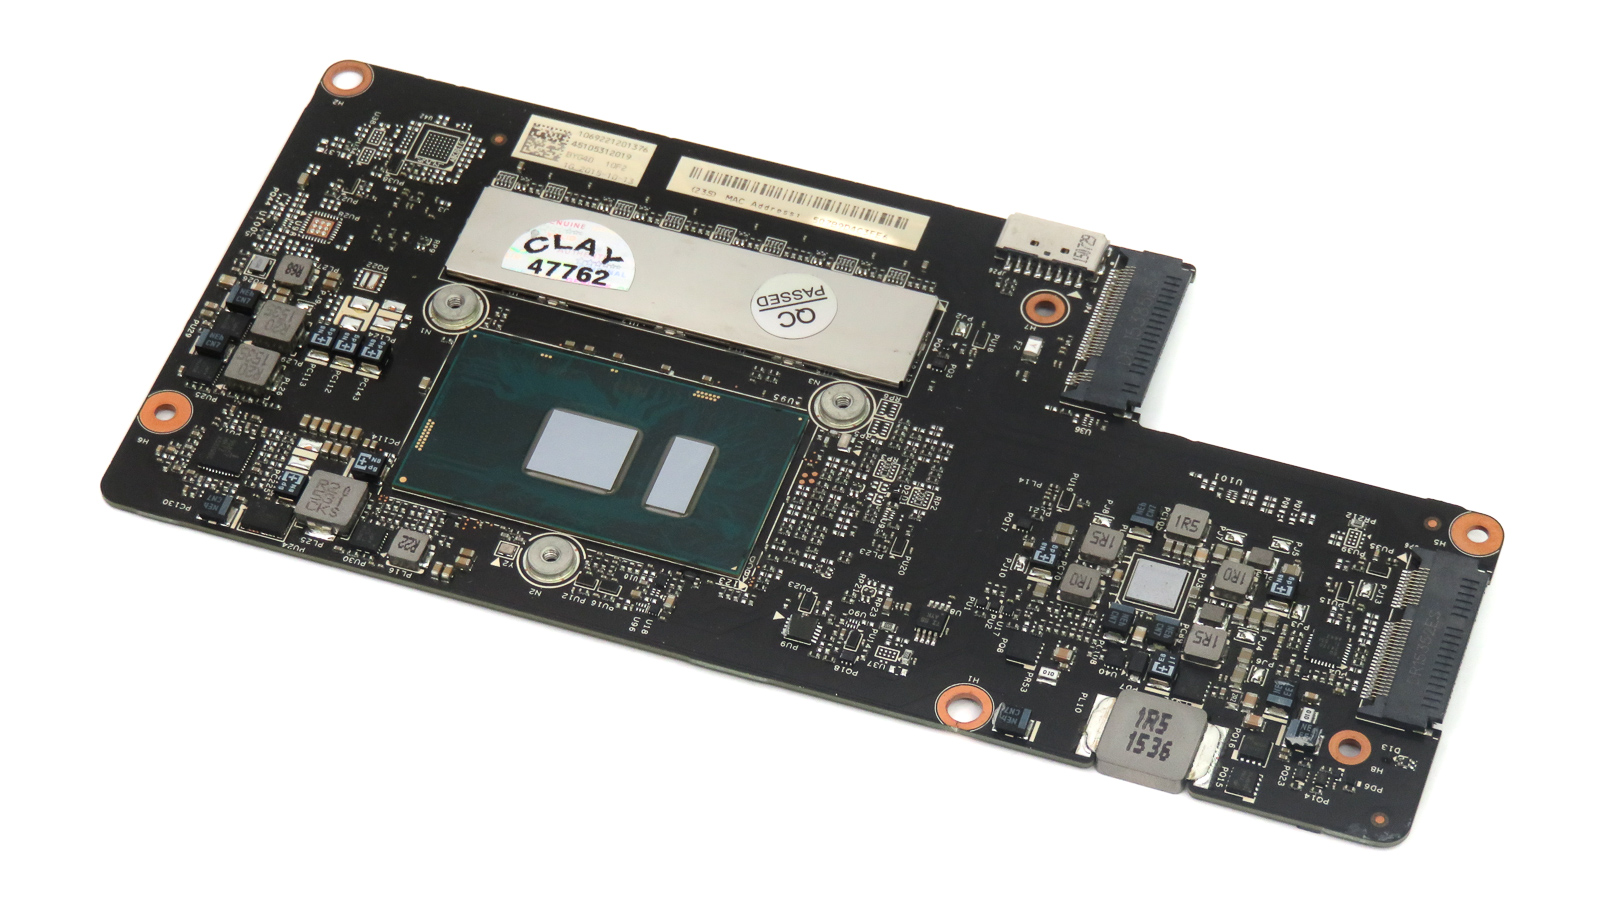 Lenovo Yoga Laptop Motherboard BYG40 W/ Intel I7-6500U CPU W5B20K48454